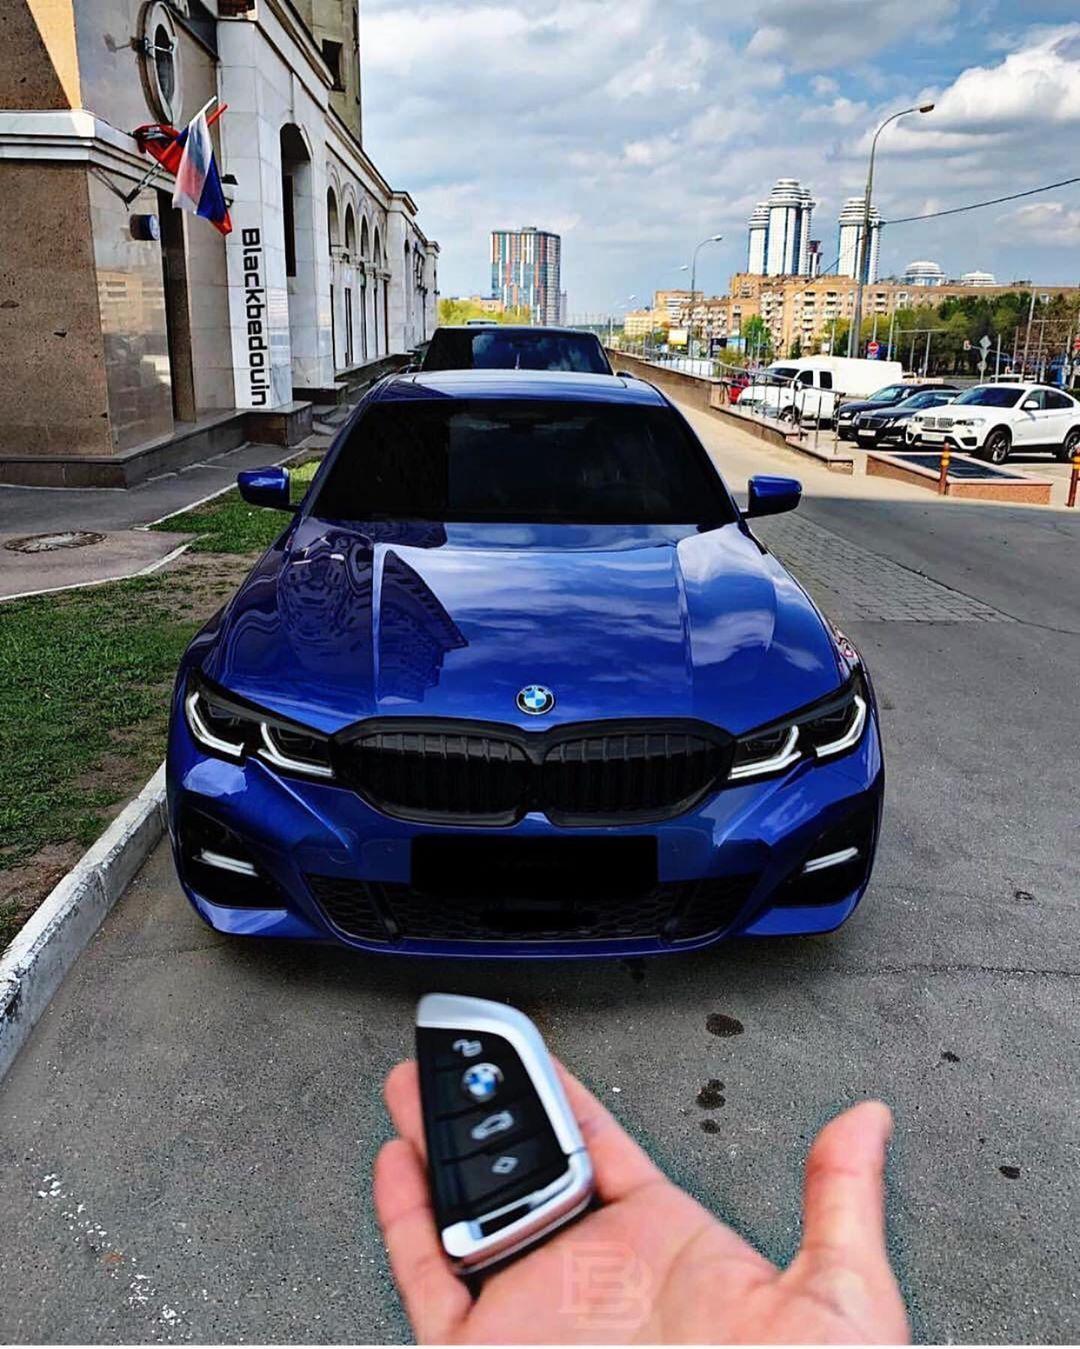 7 237 Sviђaњa 73 Komentara A1 Garage Ryan M A1 Garage U Aplikaciјi Instagram The New Bmw 330i G20 Yay Bmw Touring Bmw Blue Luxury Cars Mercedes